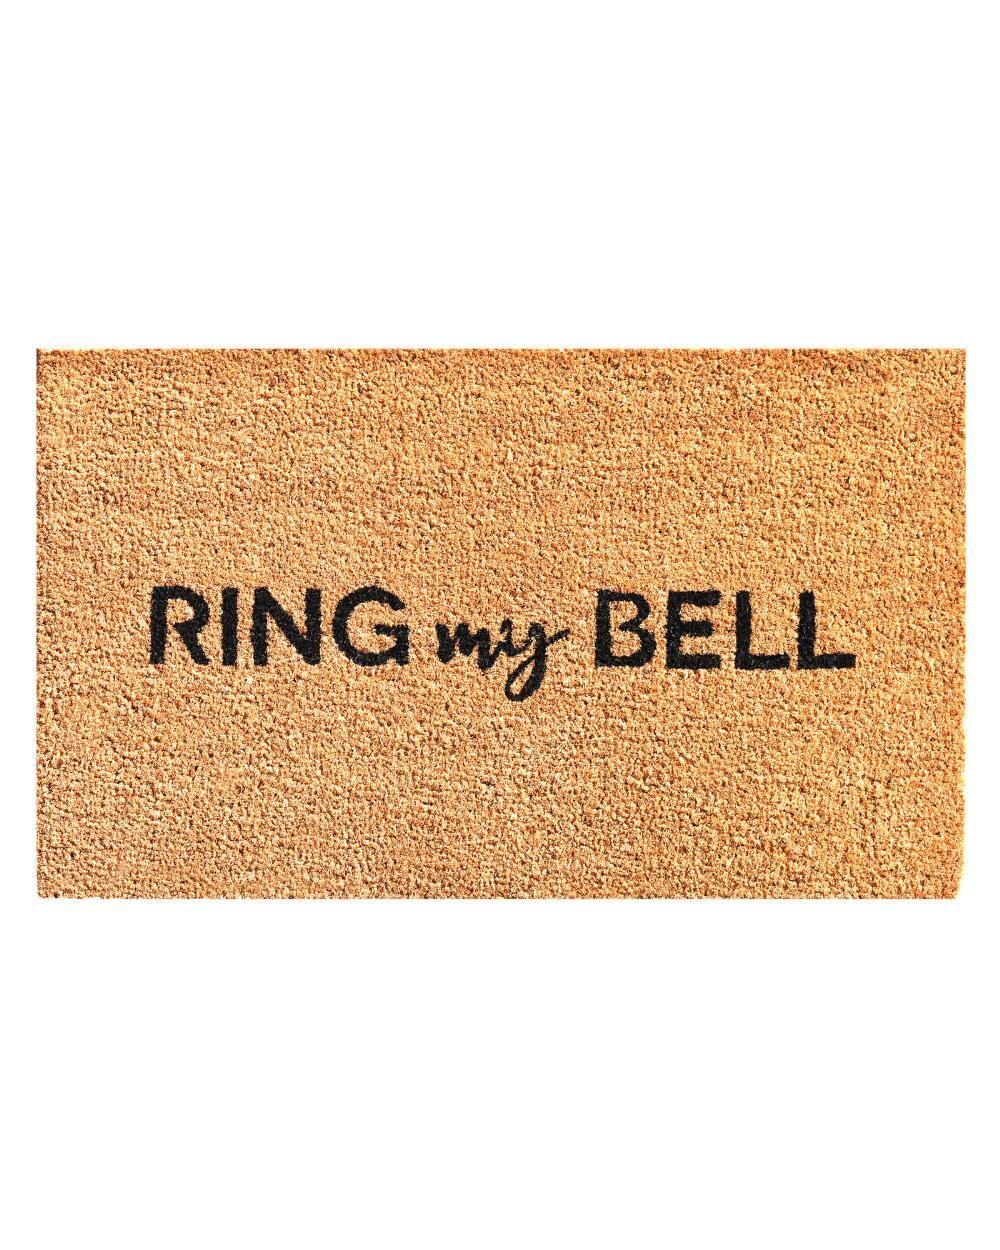 Ring My Bell Doormat 17 X 29 Ring My Bell Rings Decor